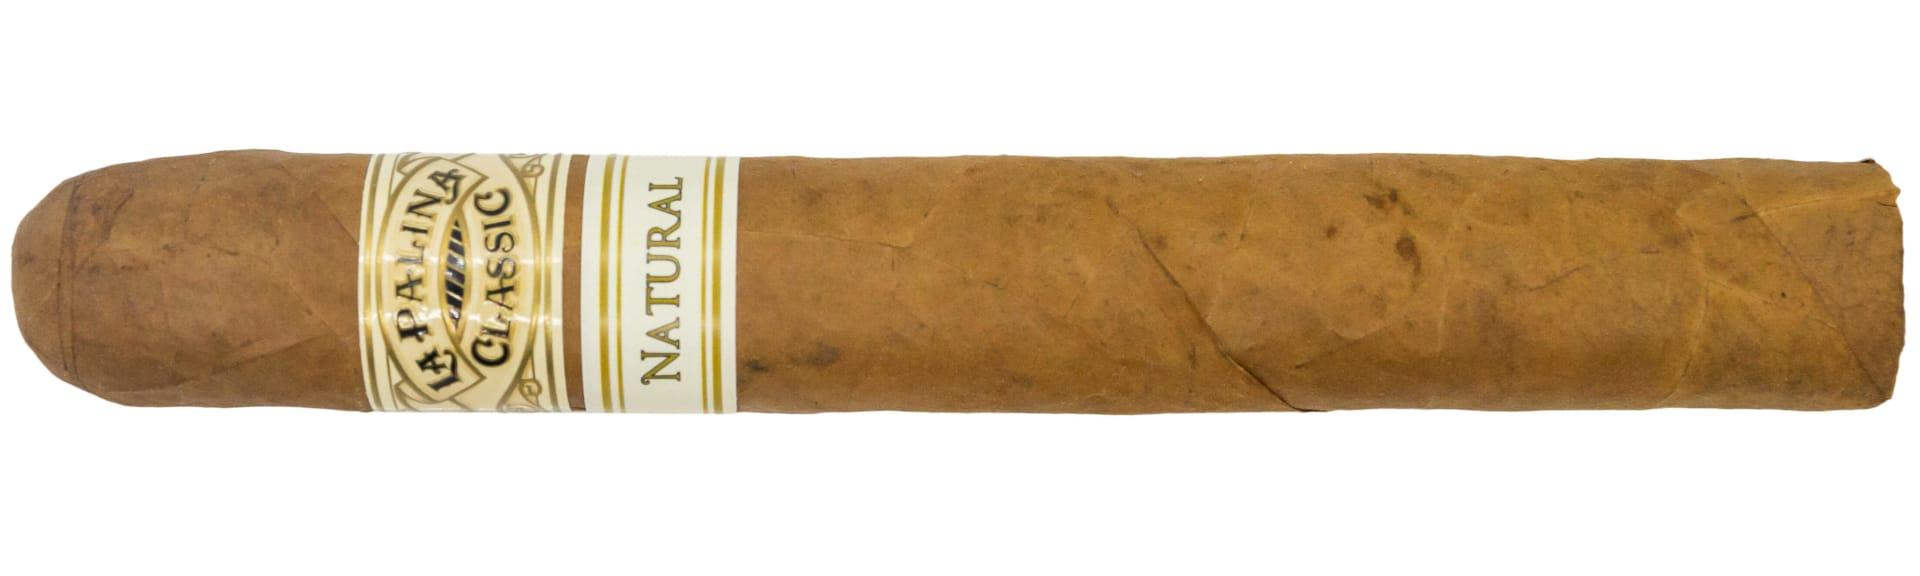 Blind Cigar Review: La Palina | Classic Natural Toro Featured Image